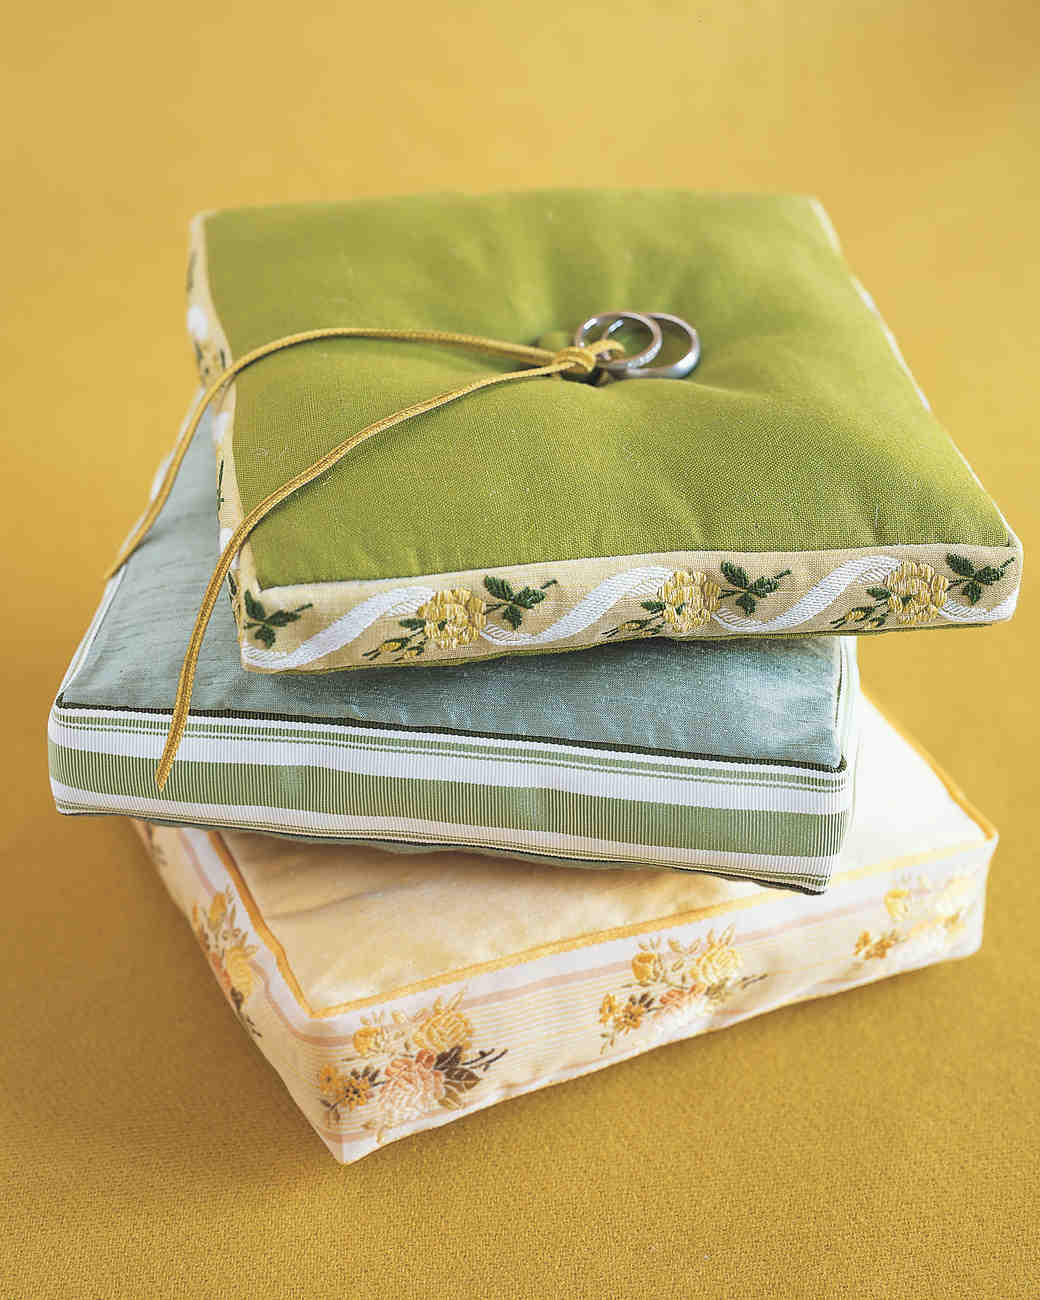 diy-ring-pillows-mw0404gtha2-ribbon-0515.jpg